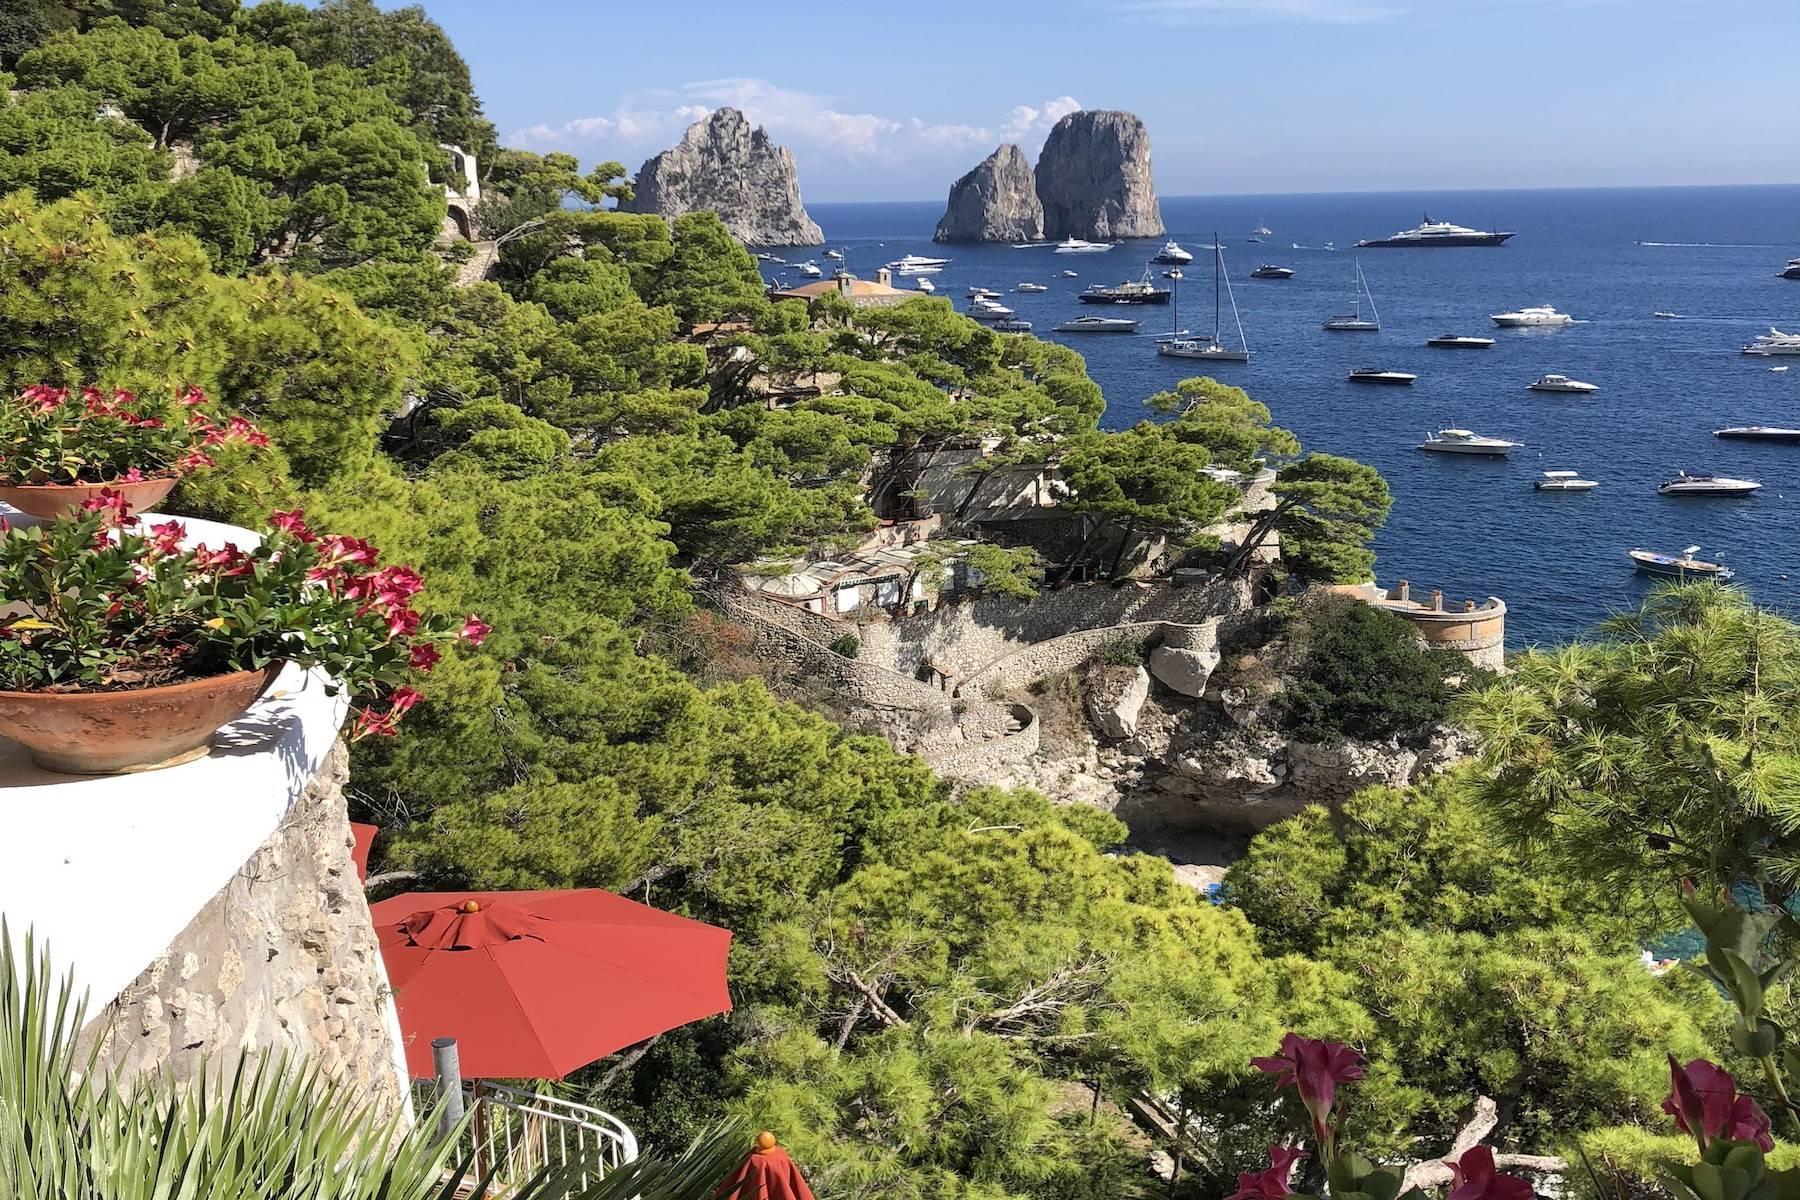 Pied-dans-l'eau Villa in Capri - 1